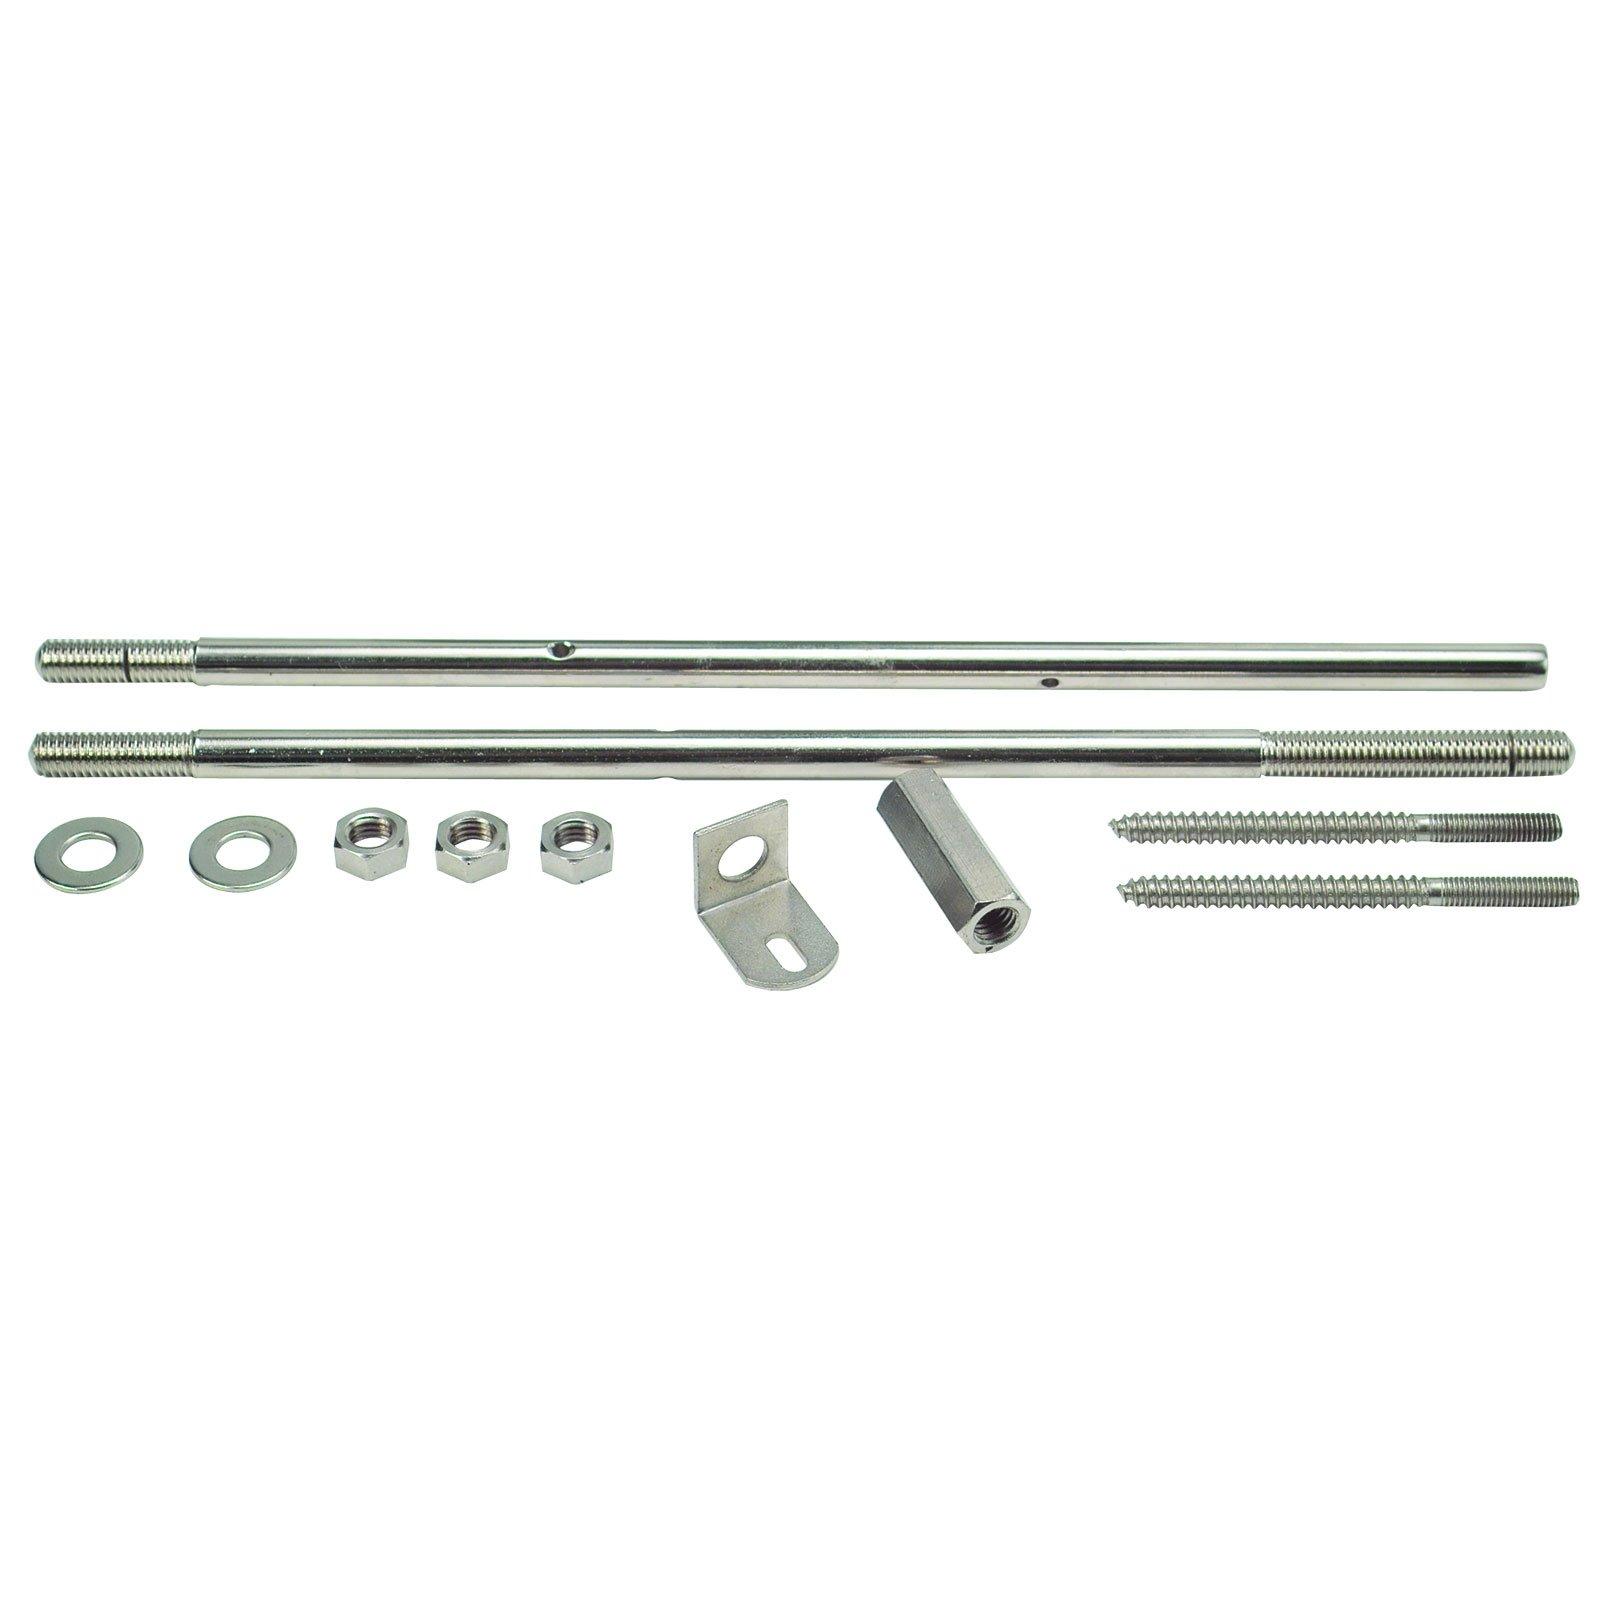 Golden Gate P-171 Banjo Coordinator Rods For Single-Piece Flange - Nickel-Plated Steel